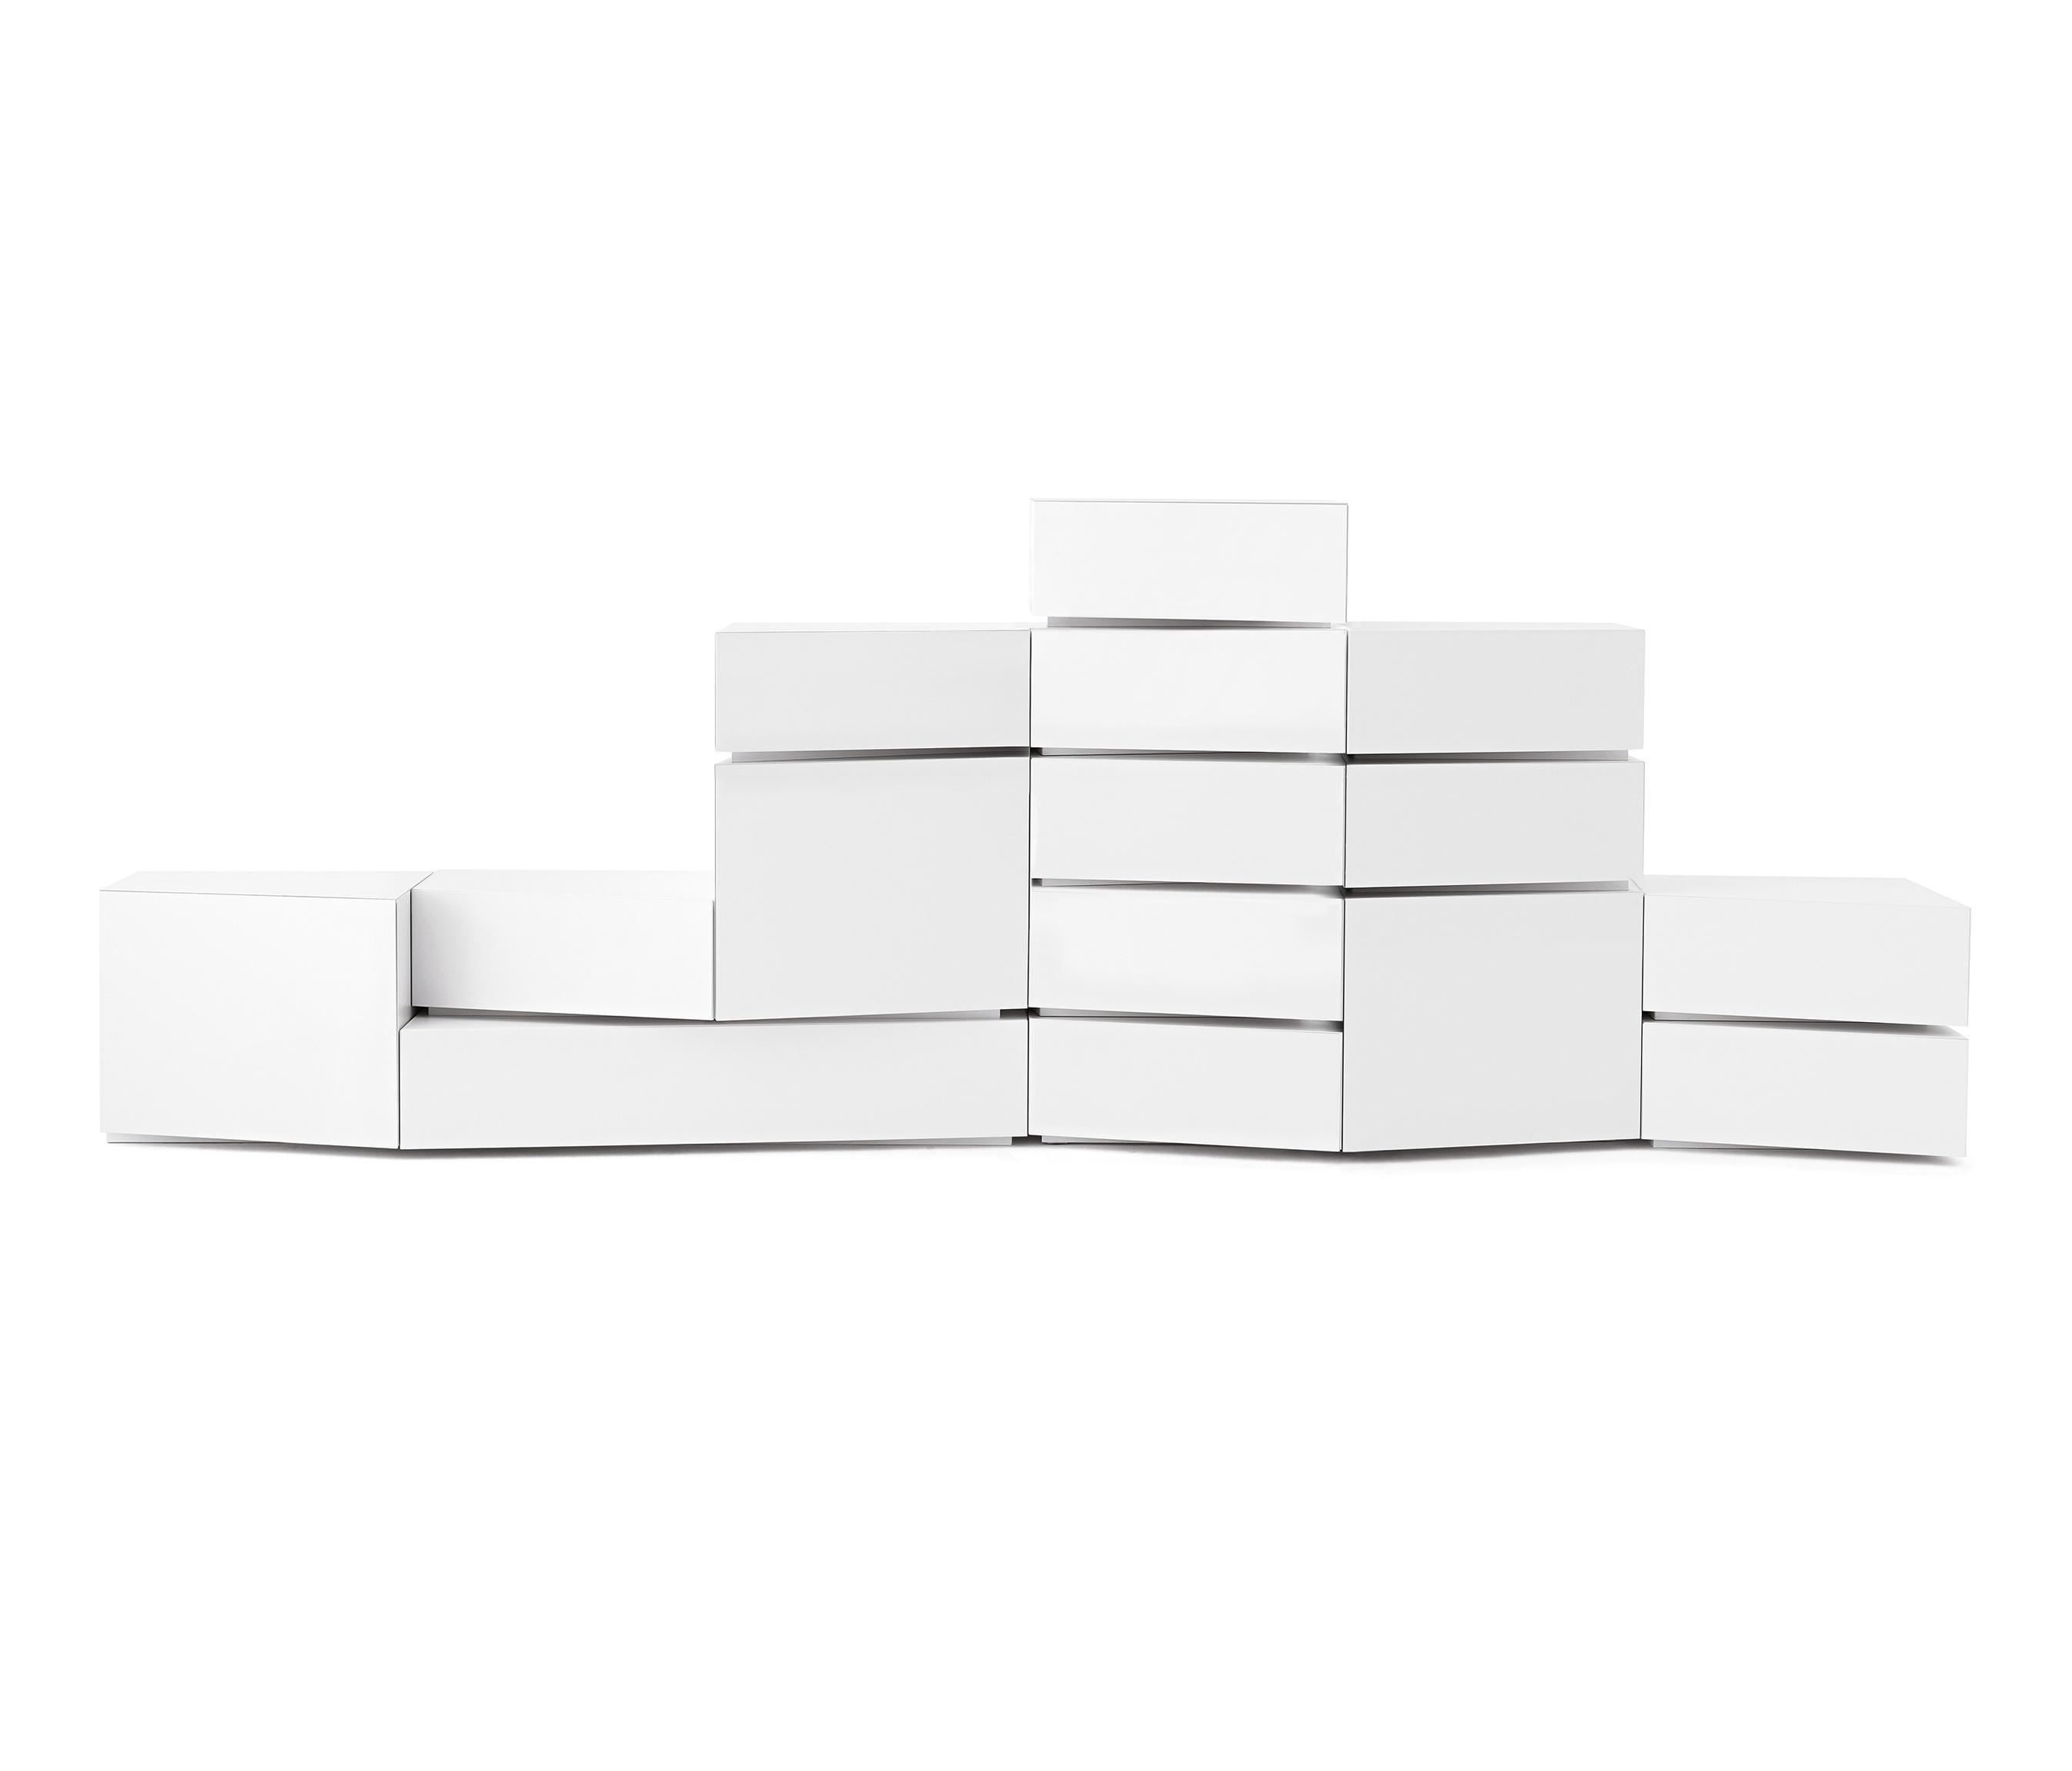 5 Blocks White - Sideboards / Kommoden Von Opinion Ciatti with regard to Thite Sideboards (Image 1 of 30)